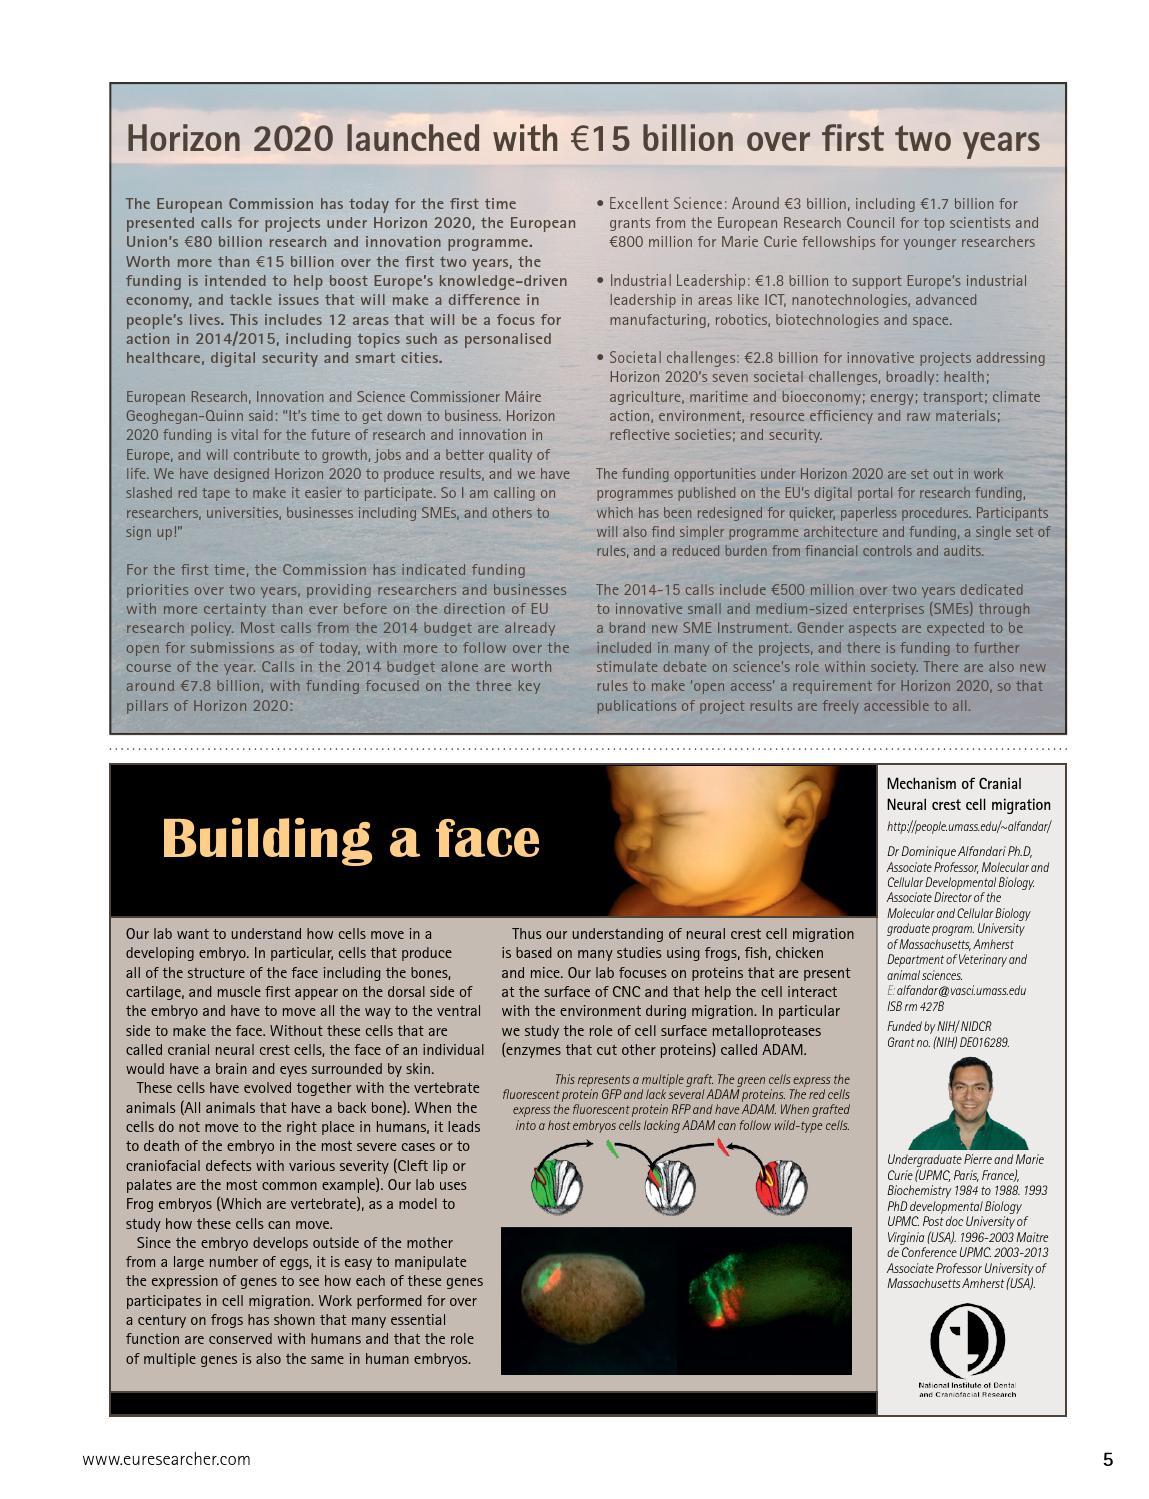 Eu res 05 digital mag by Blazon Publishing and Media Ltd - issuu